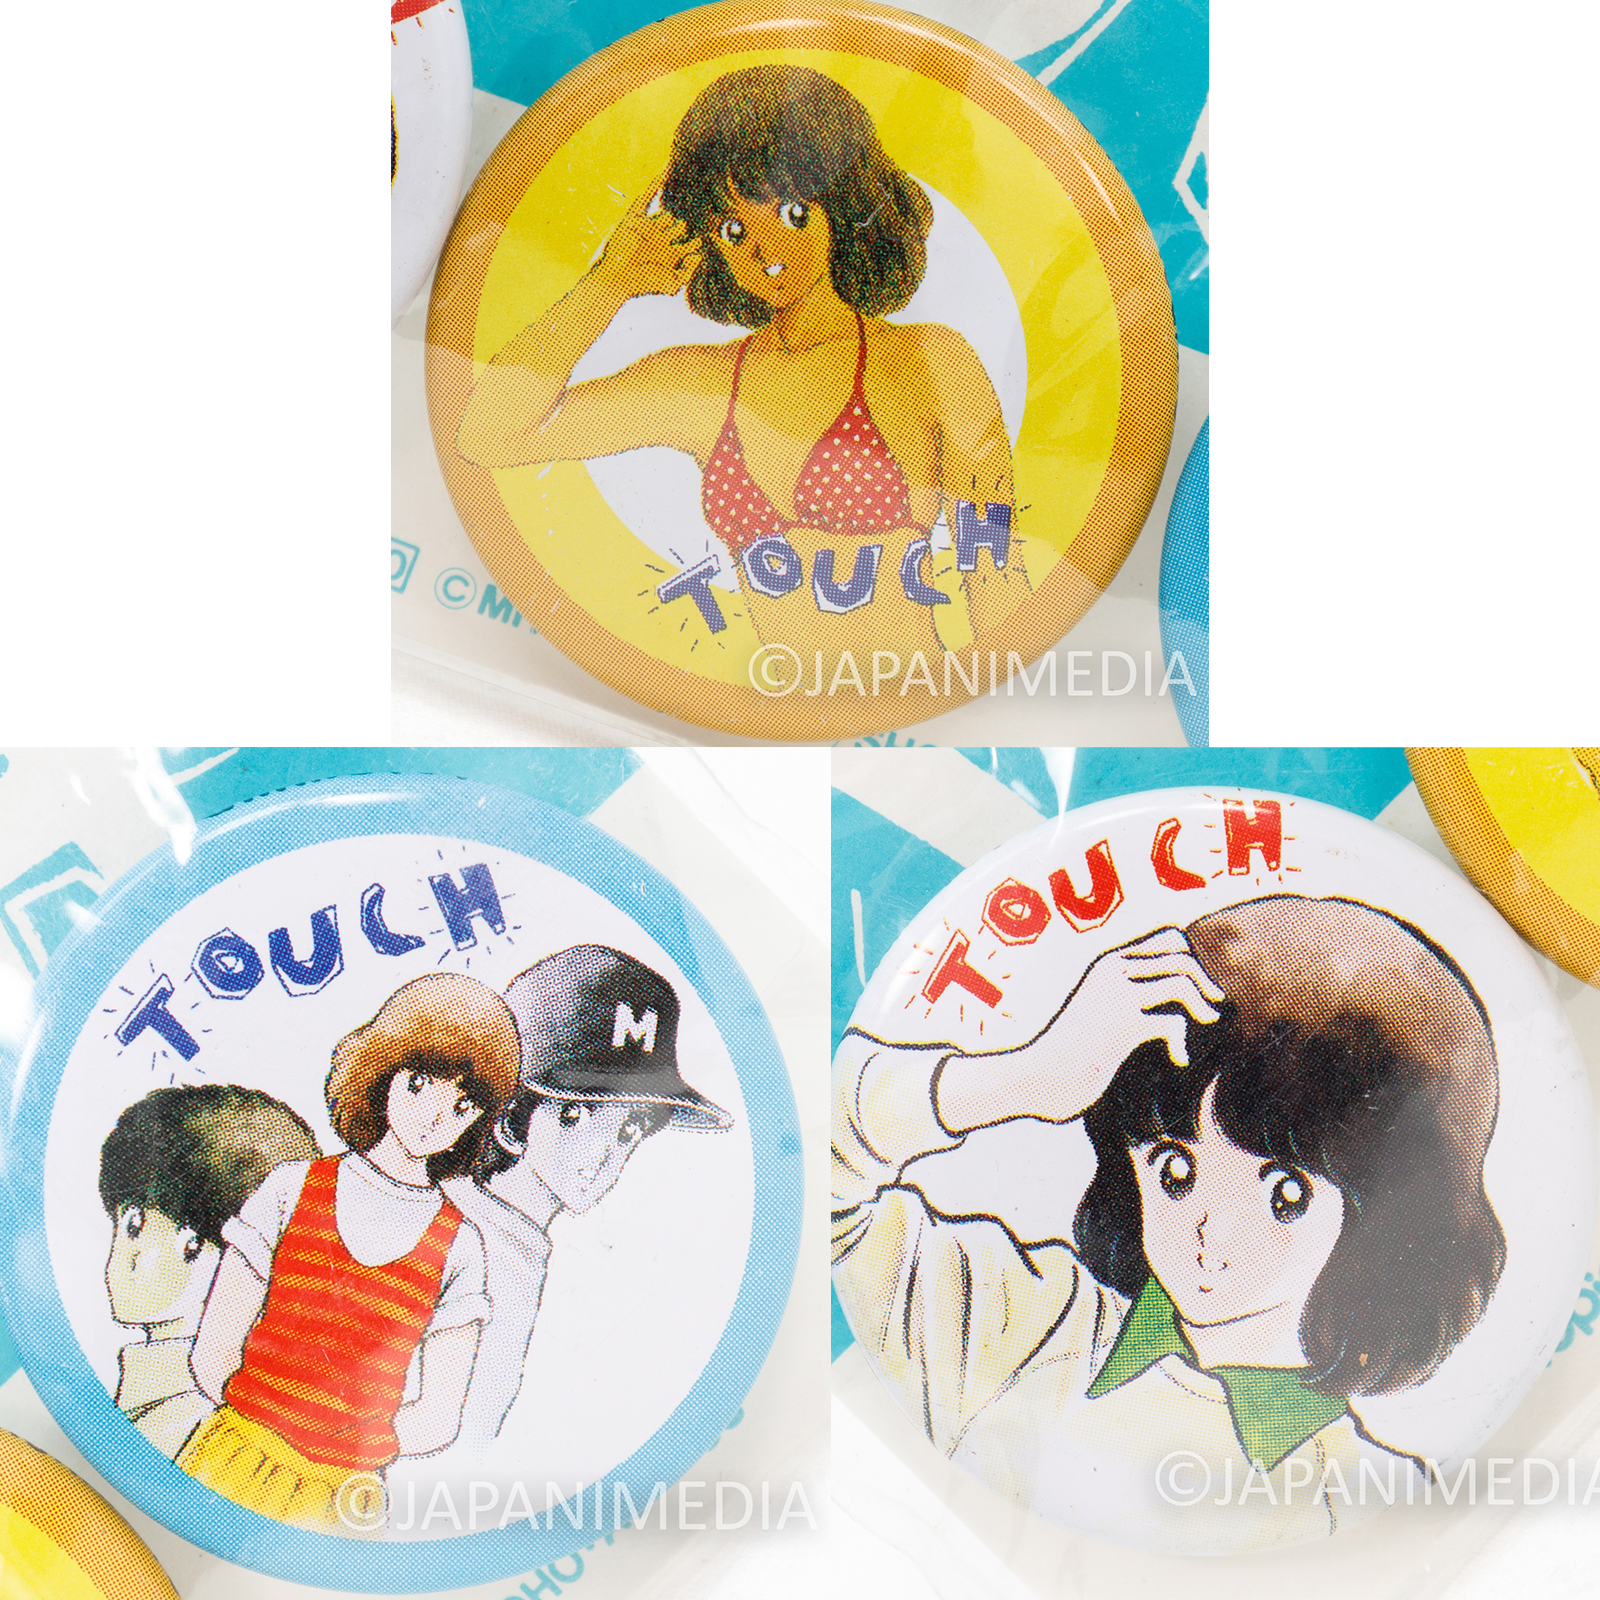 TOUCH Minami Asakura Button Badge Pins 3pc Set Mitsuru Adachi JAPAN ANIME